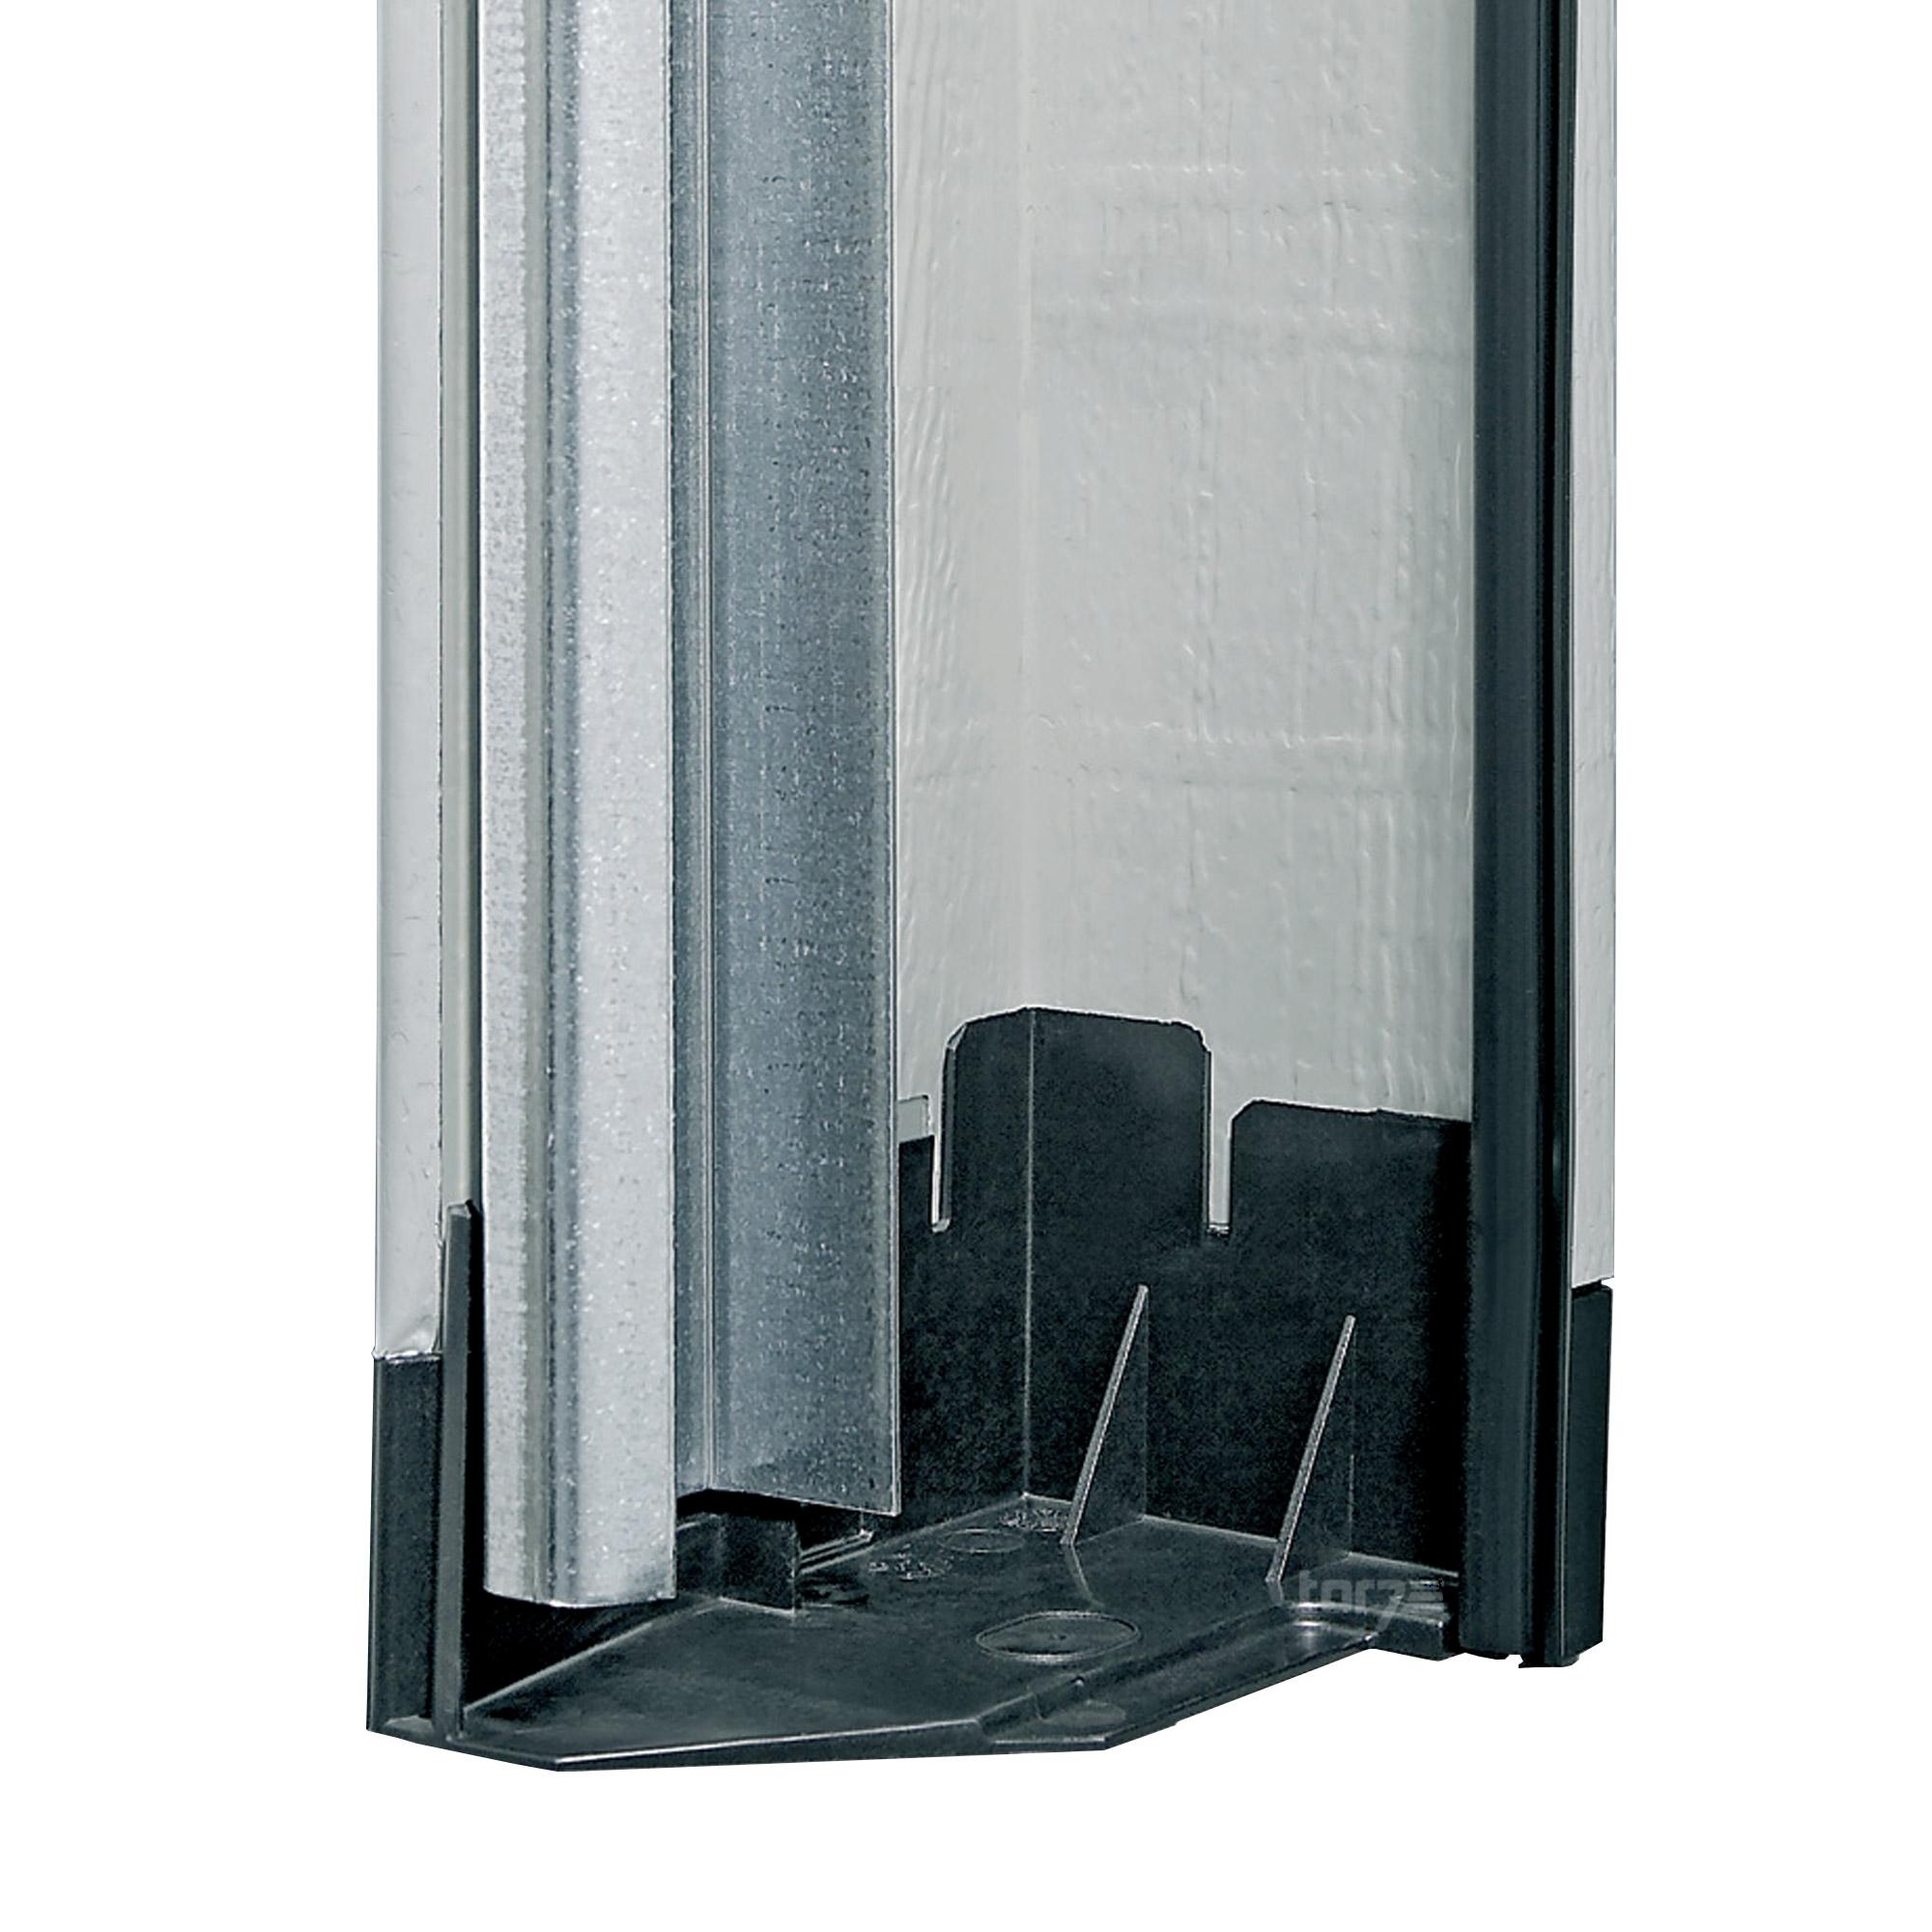 h rmann sektionaltor 42mm 2375x2125mm 8028 terrabraun garagentor rolltor ebay. Black Bedroom Furniture Sets. Home Design Ideas